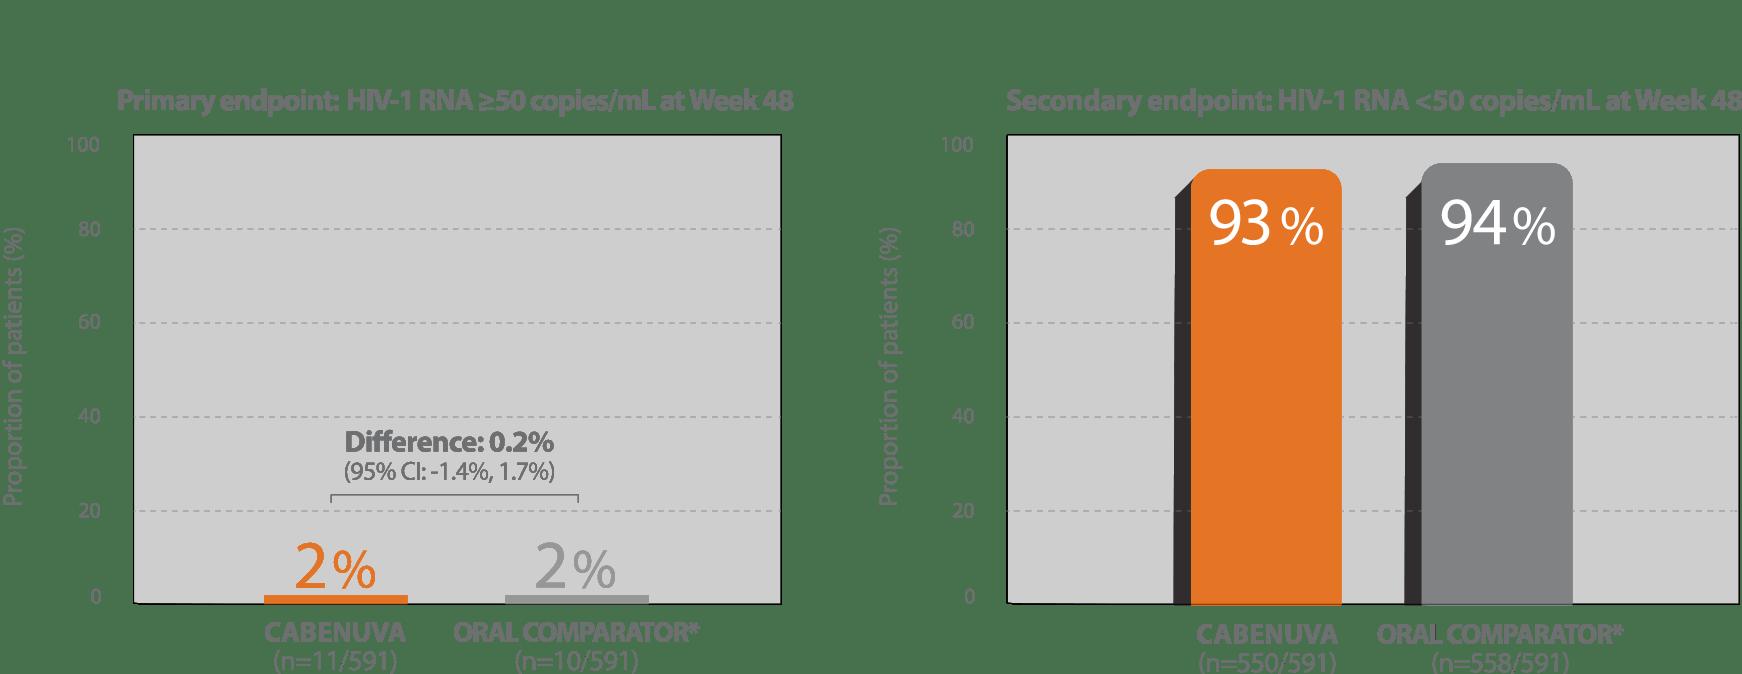 CABENUVA efficacy data